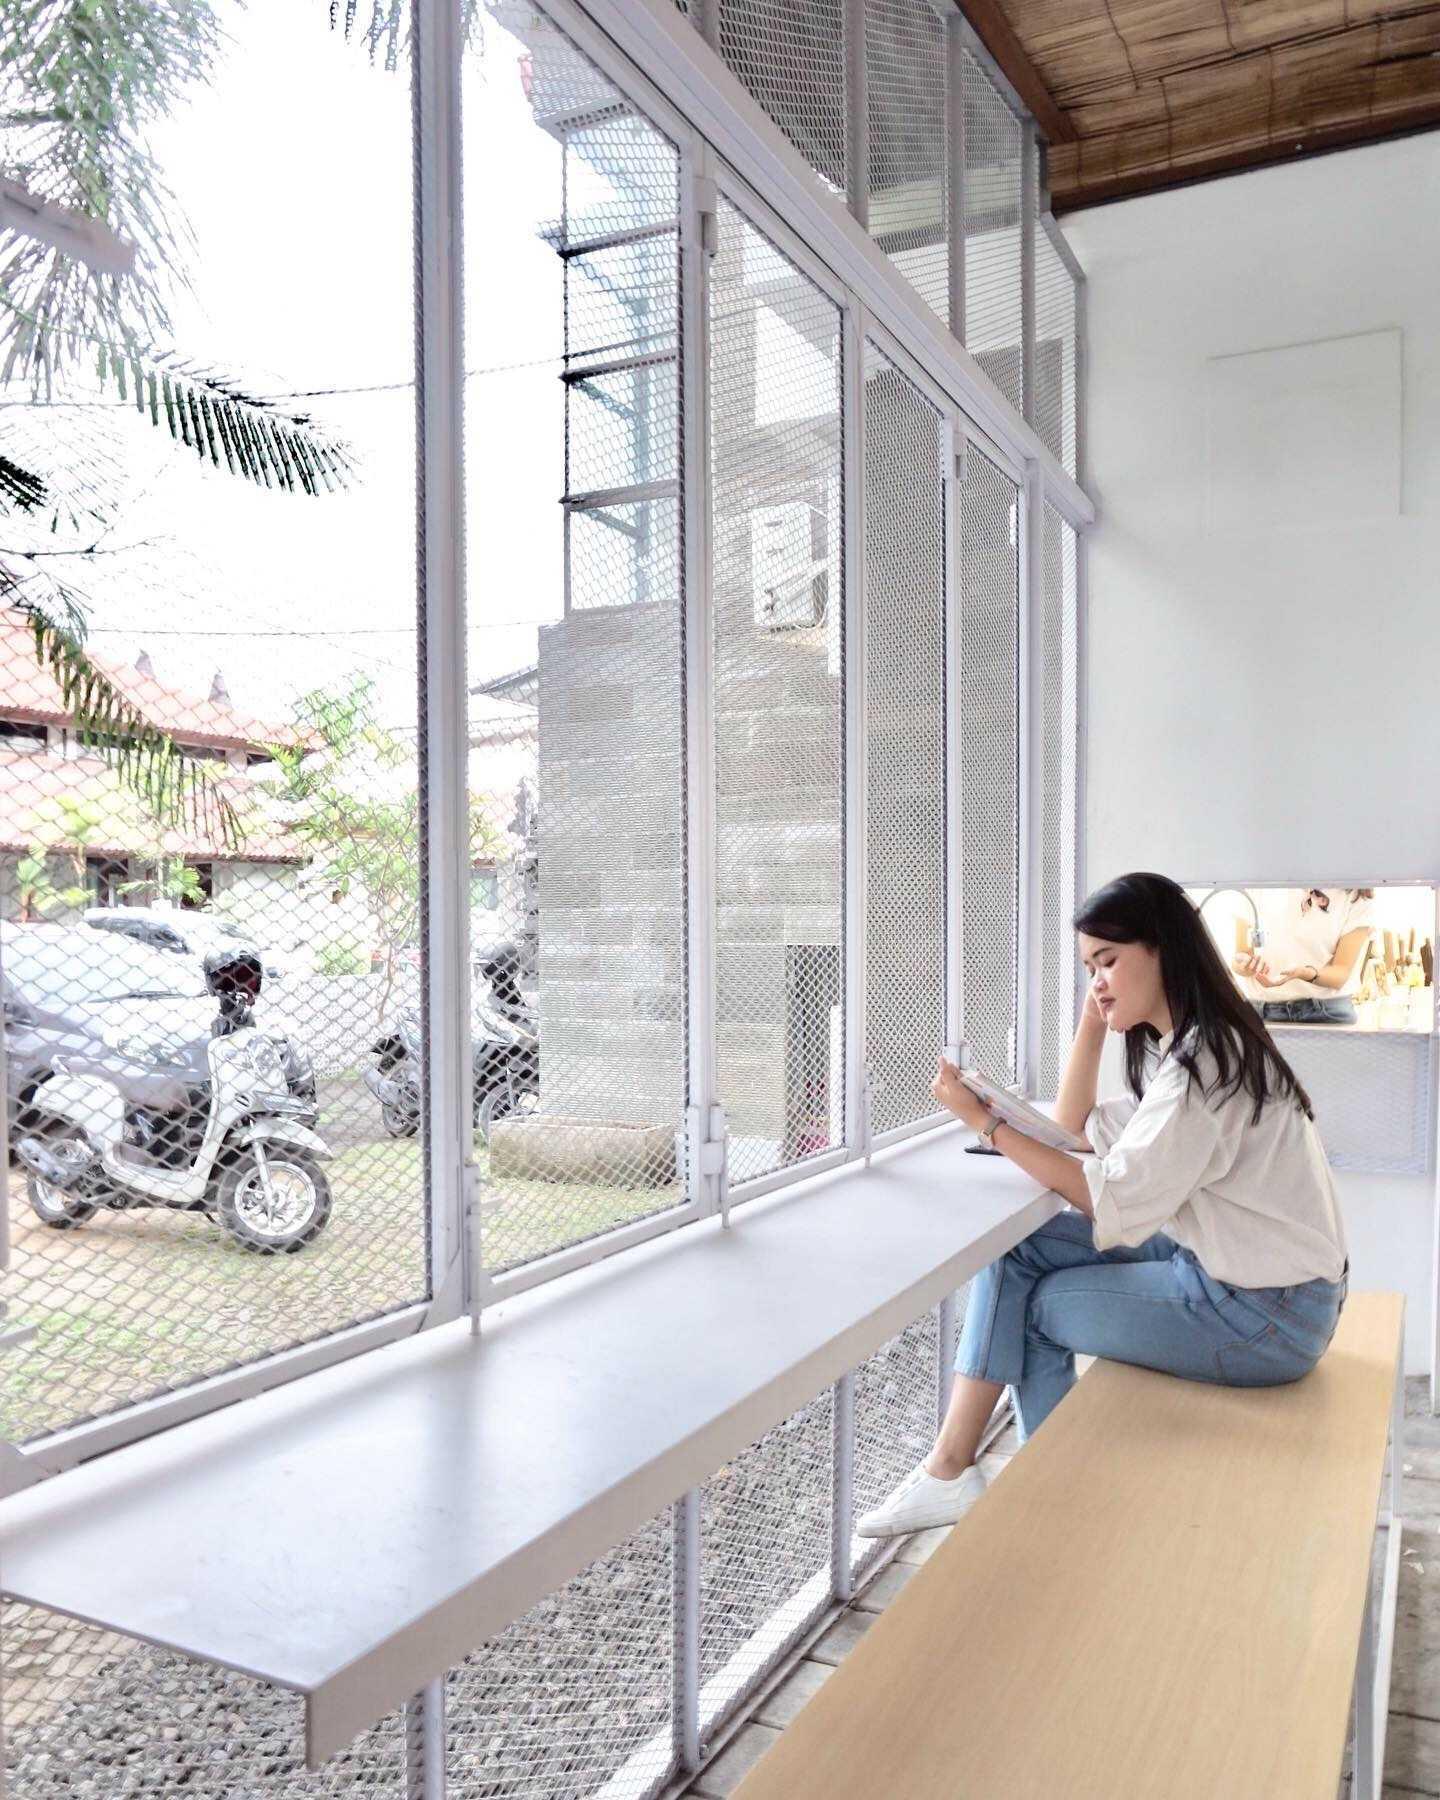 Sume Interior Nt Office Kota Denpasar, Bali, Indonesia Kota Denpasar, Bali, Indonesia Sume-Interior-Nt-Office  85536